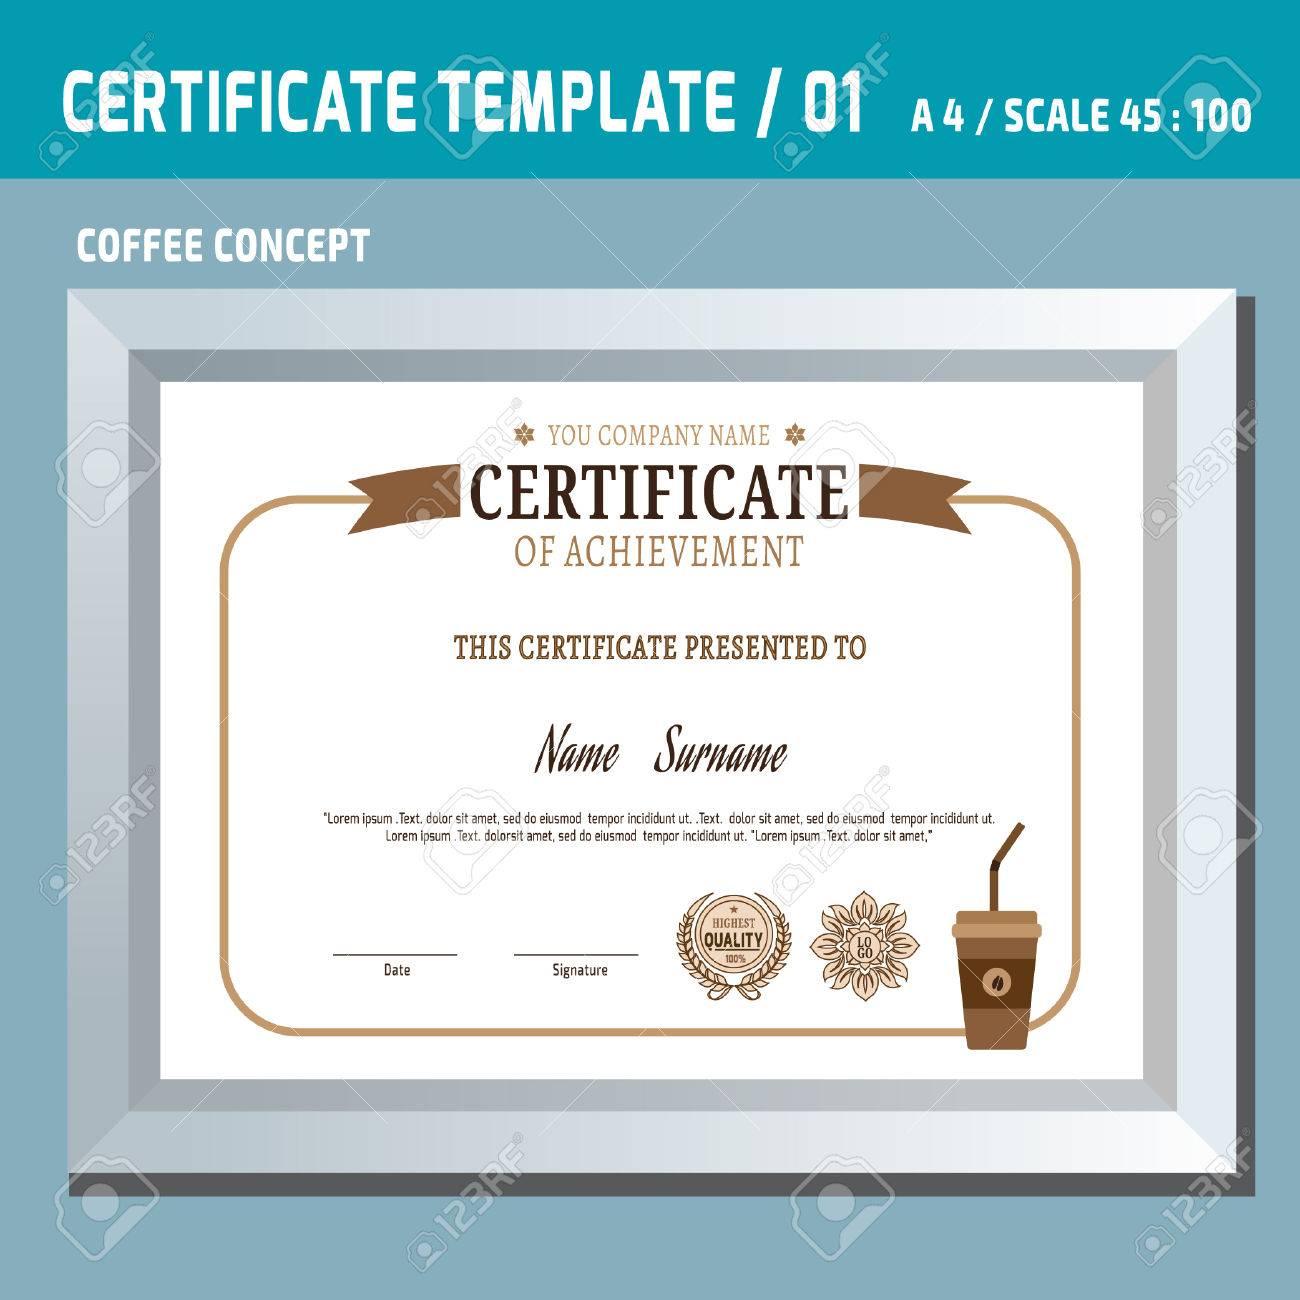 Certificate templateffeea4ctor design templatentage certificate templateffeea4ctor design templatentage retro frame diploma background yadclub Choice Image